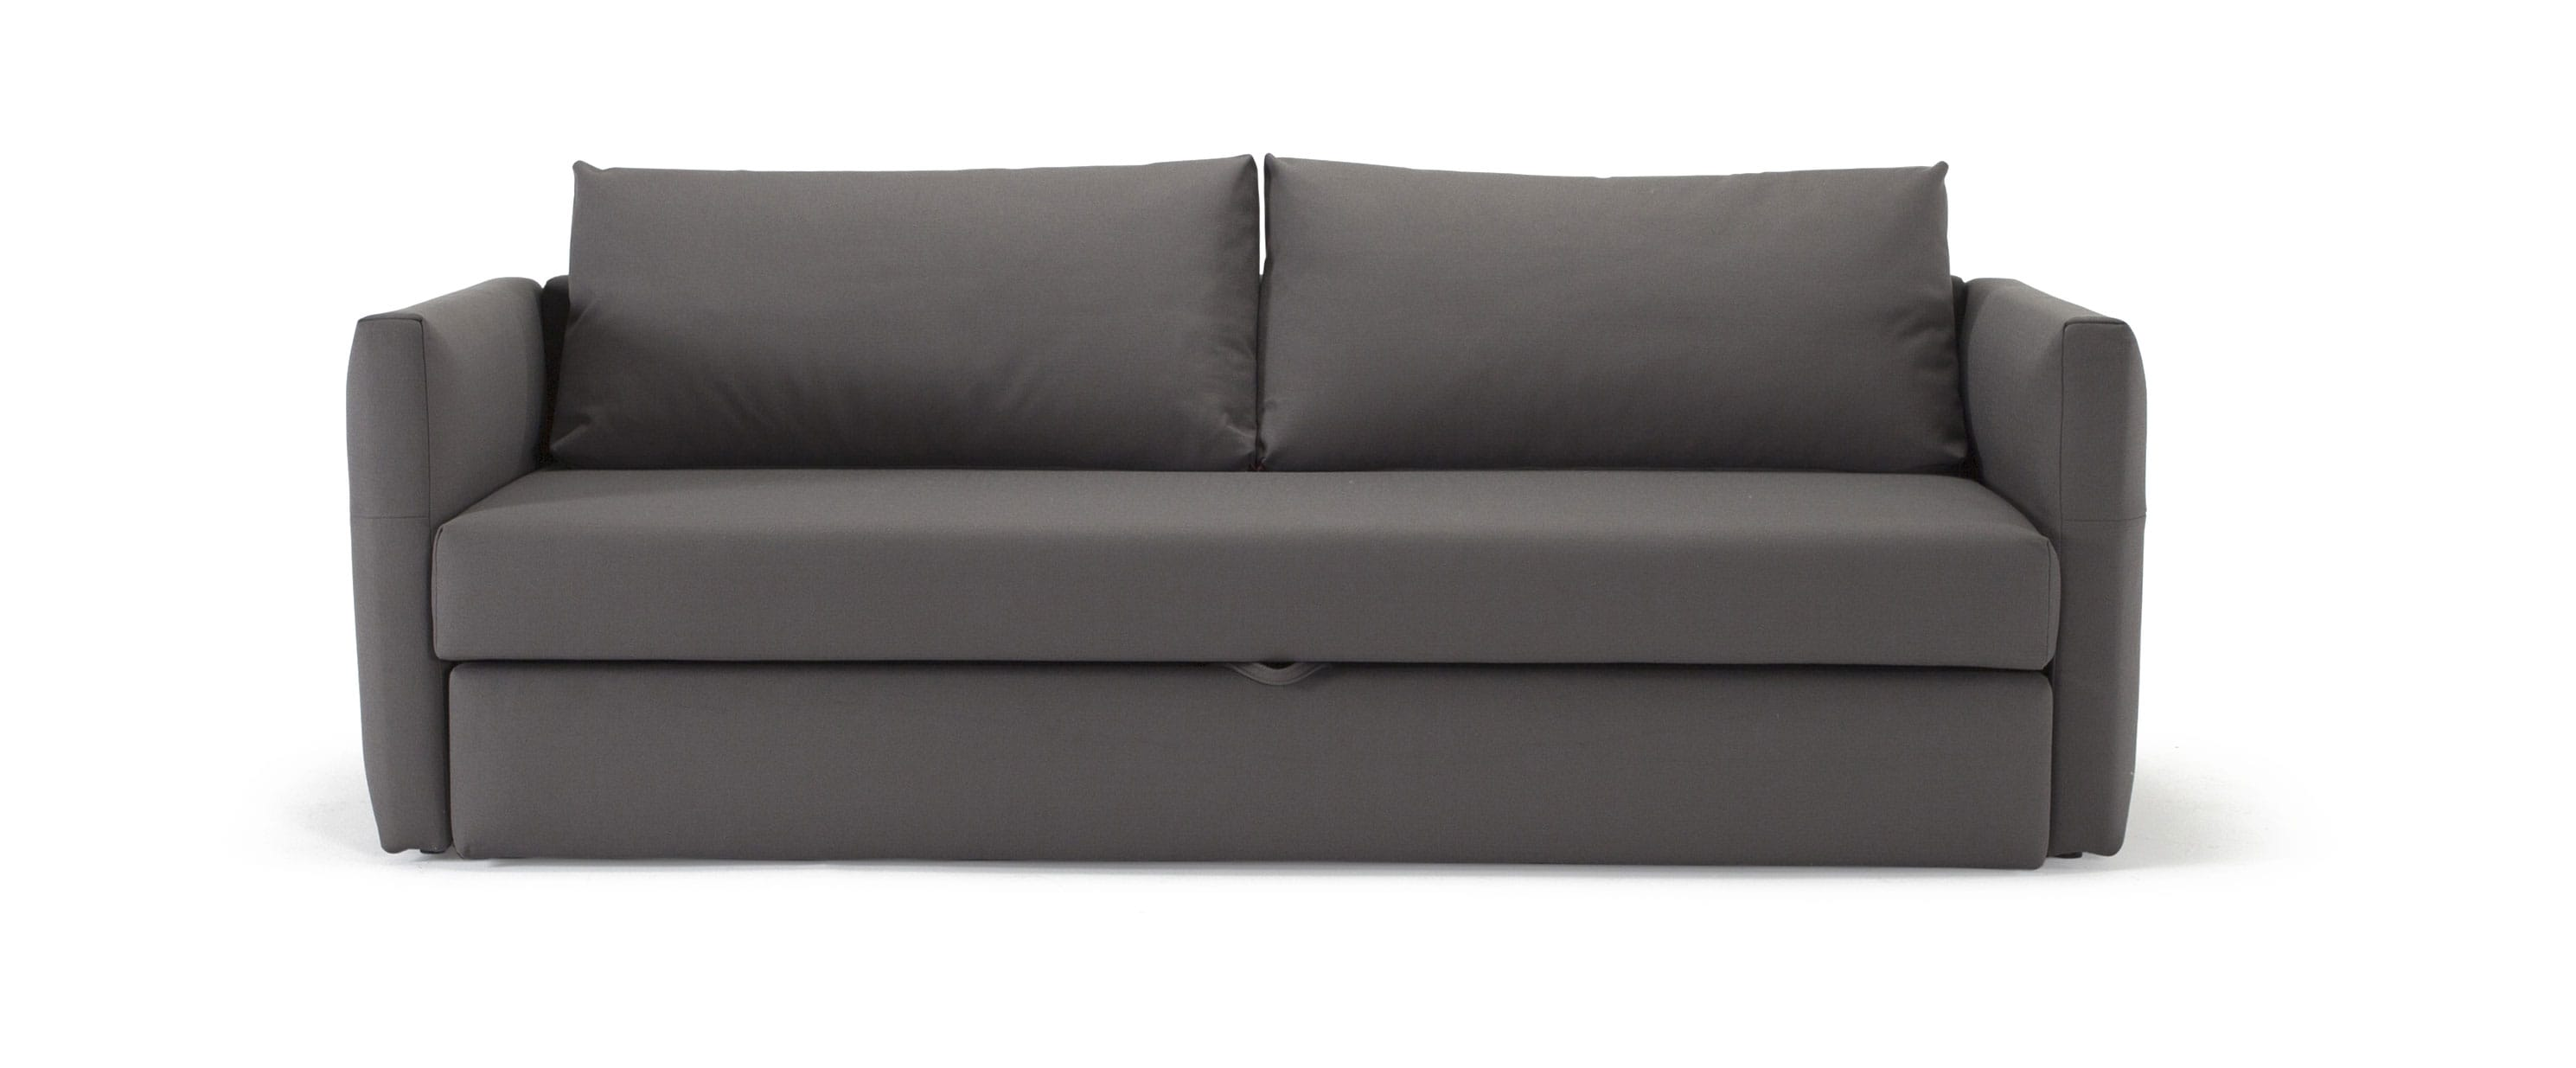 Toke Sofa Bed Full Size Coastal Seal Gray by Innovation